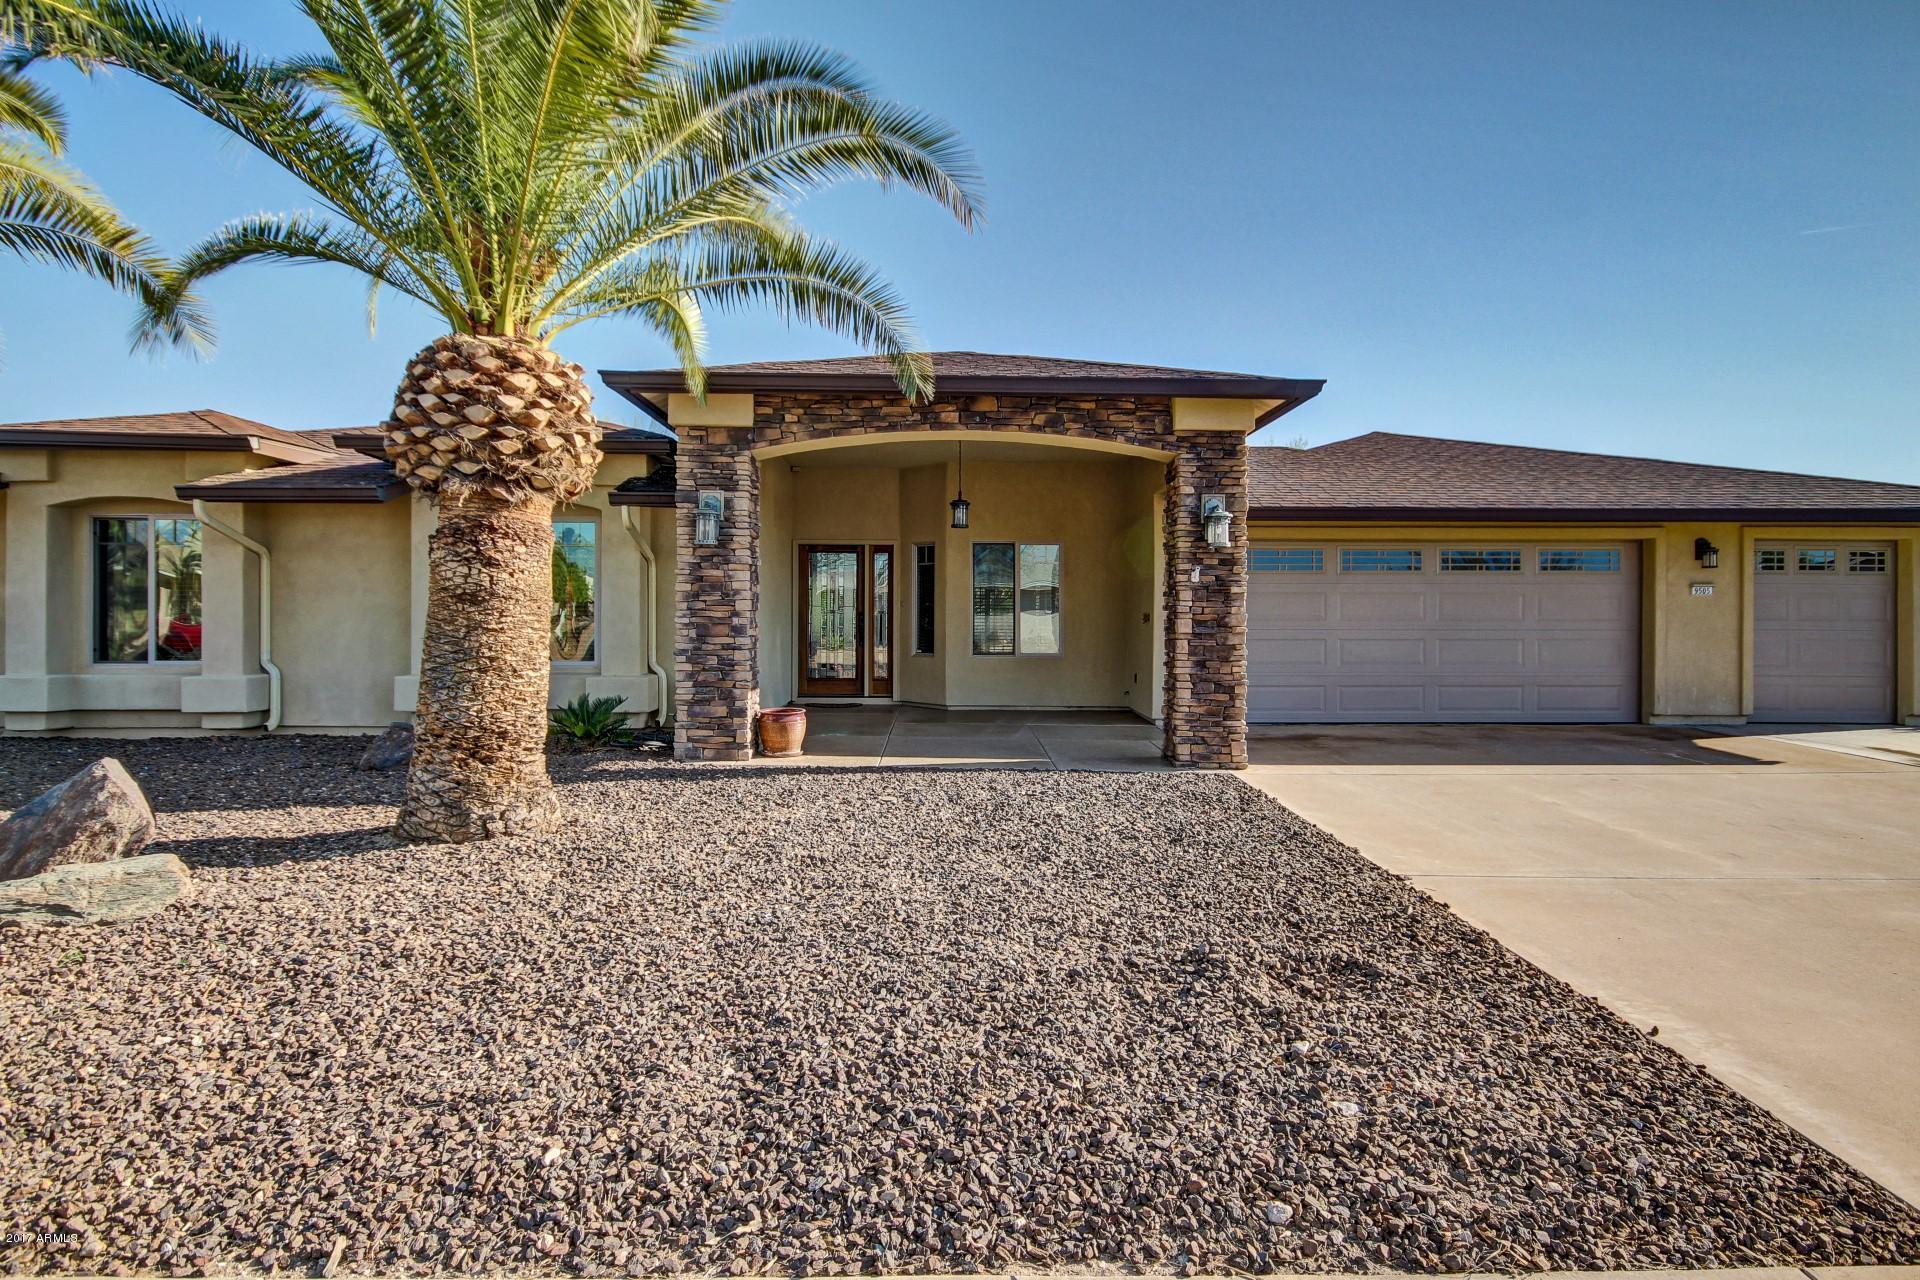 9505 W HIDDEN VALLEY CIRCLE, SUN CITY, AZ 85351